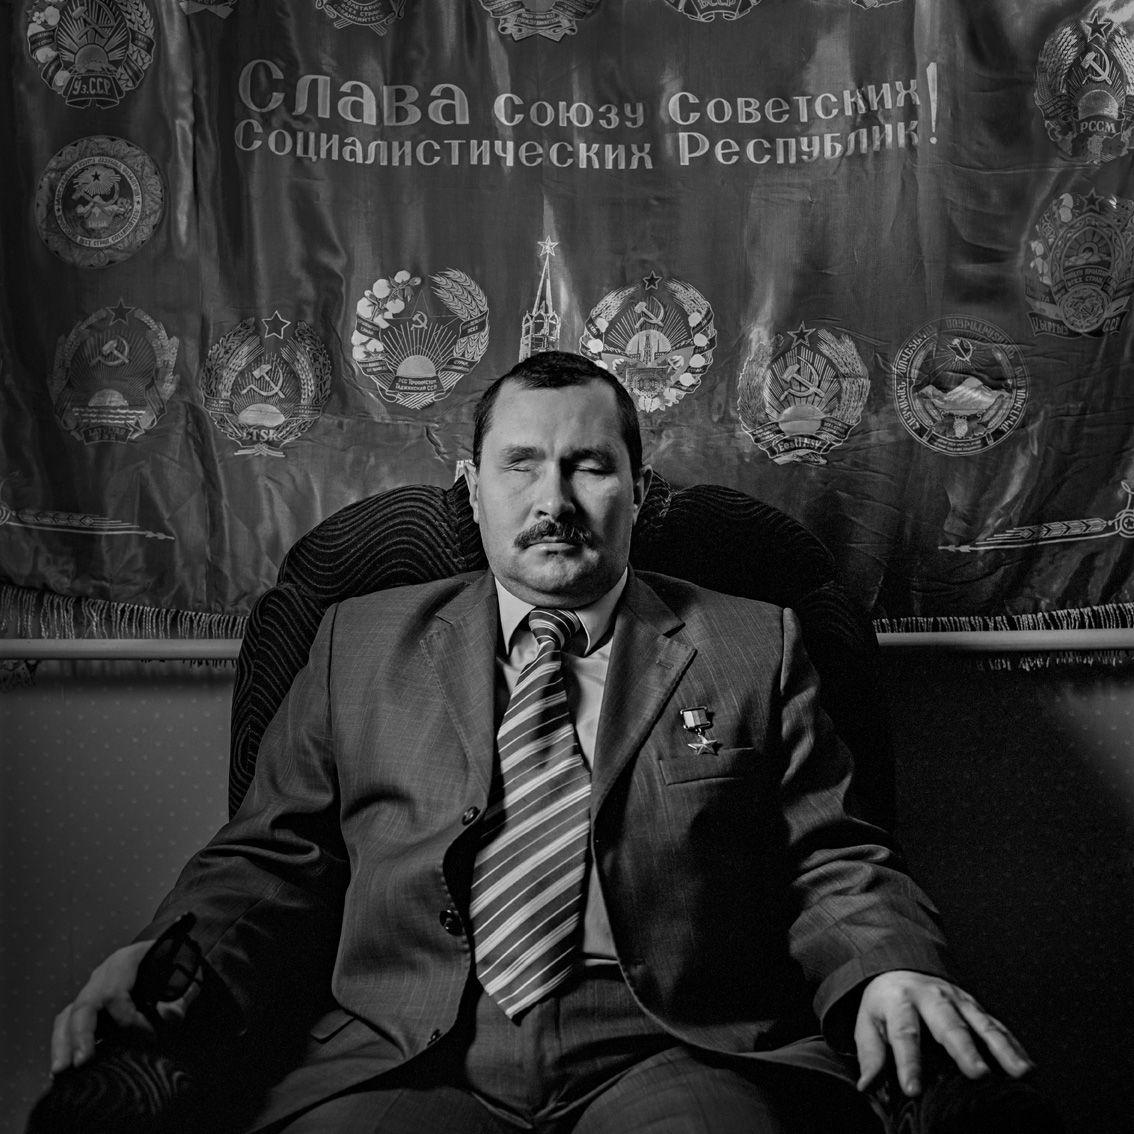 VETERANS OF SPETSNAZ: PORTRAITS OF SECRET SOLDIERS - 5